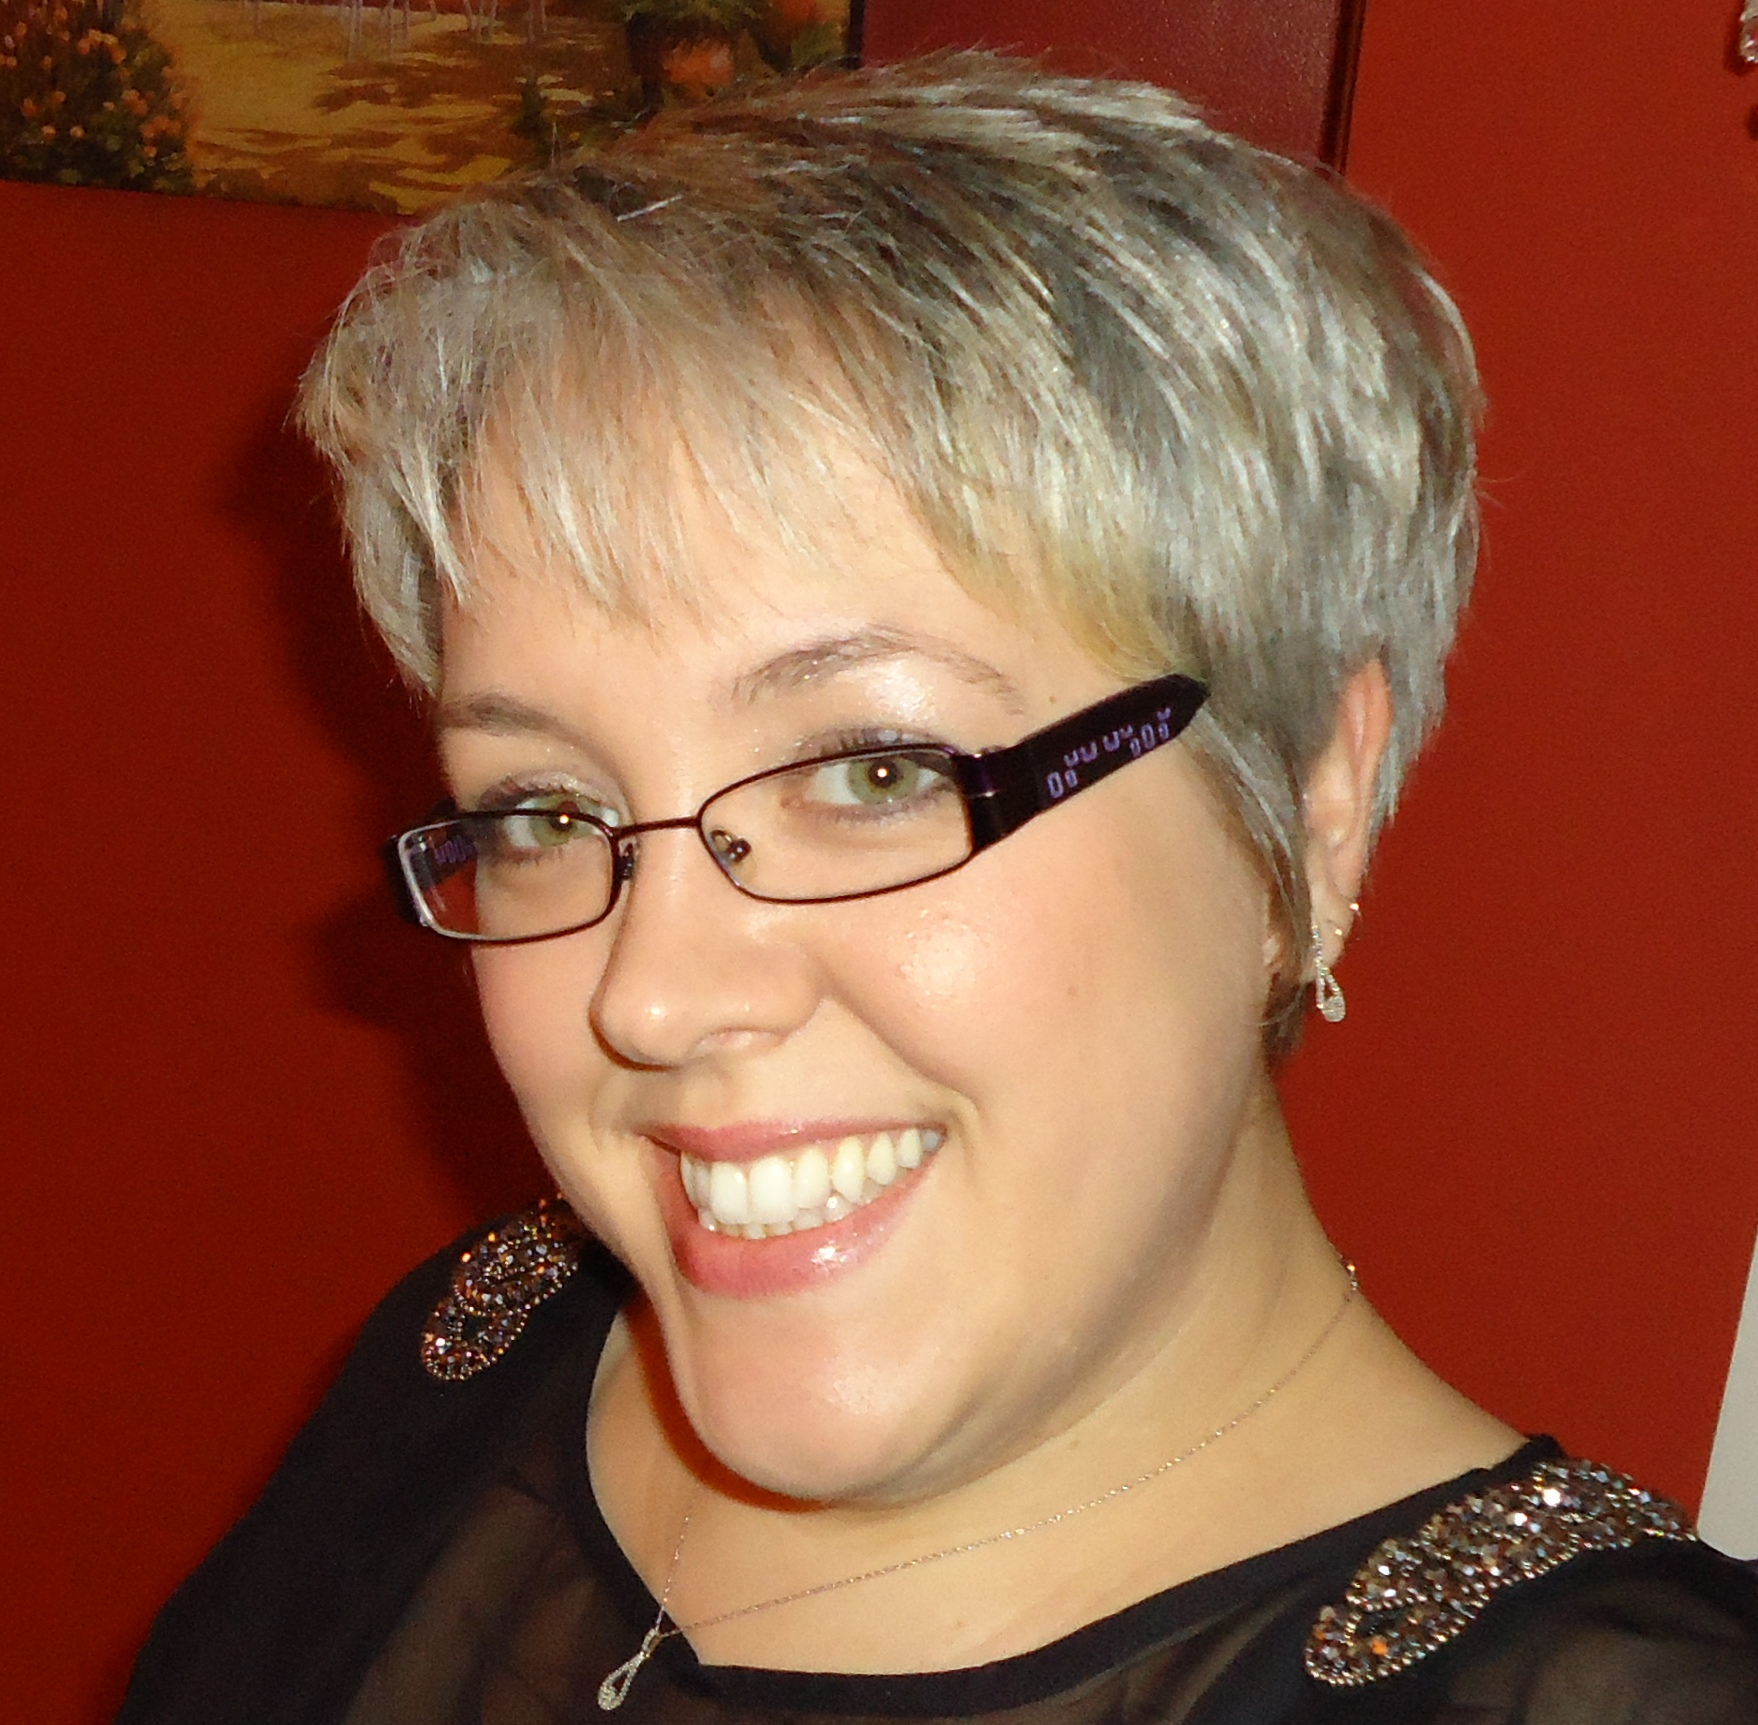 Hairstyles short hair 40 year old woman - Jennifer Jones